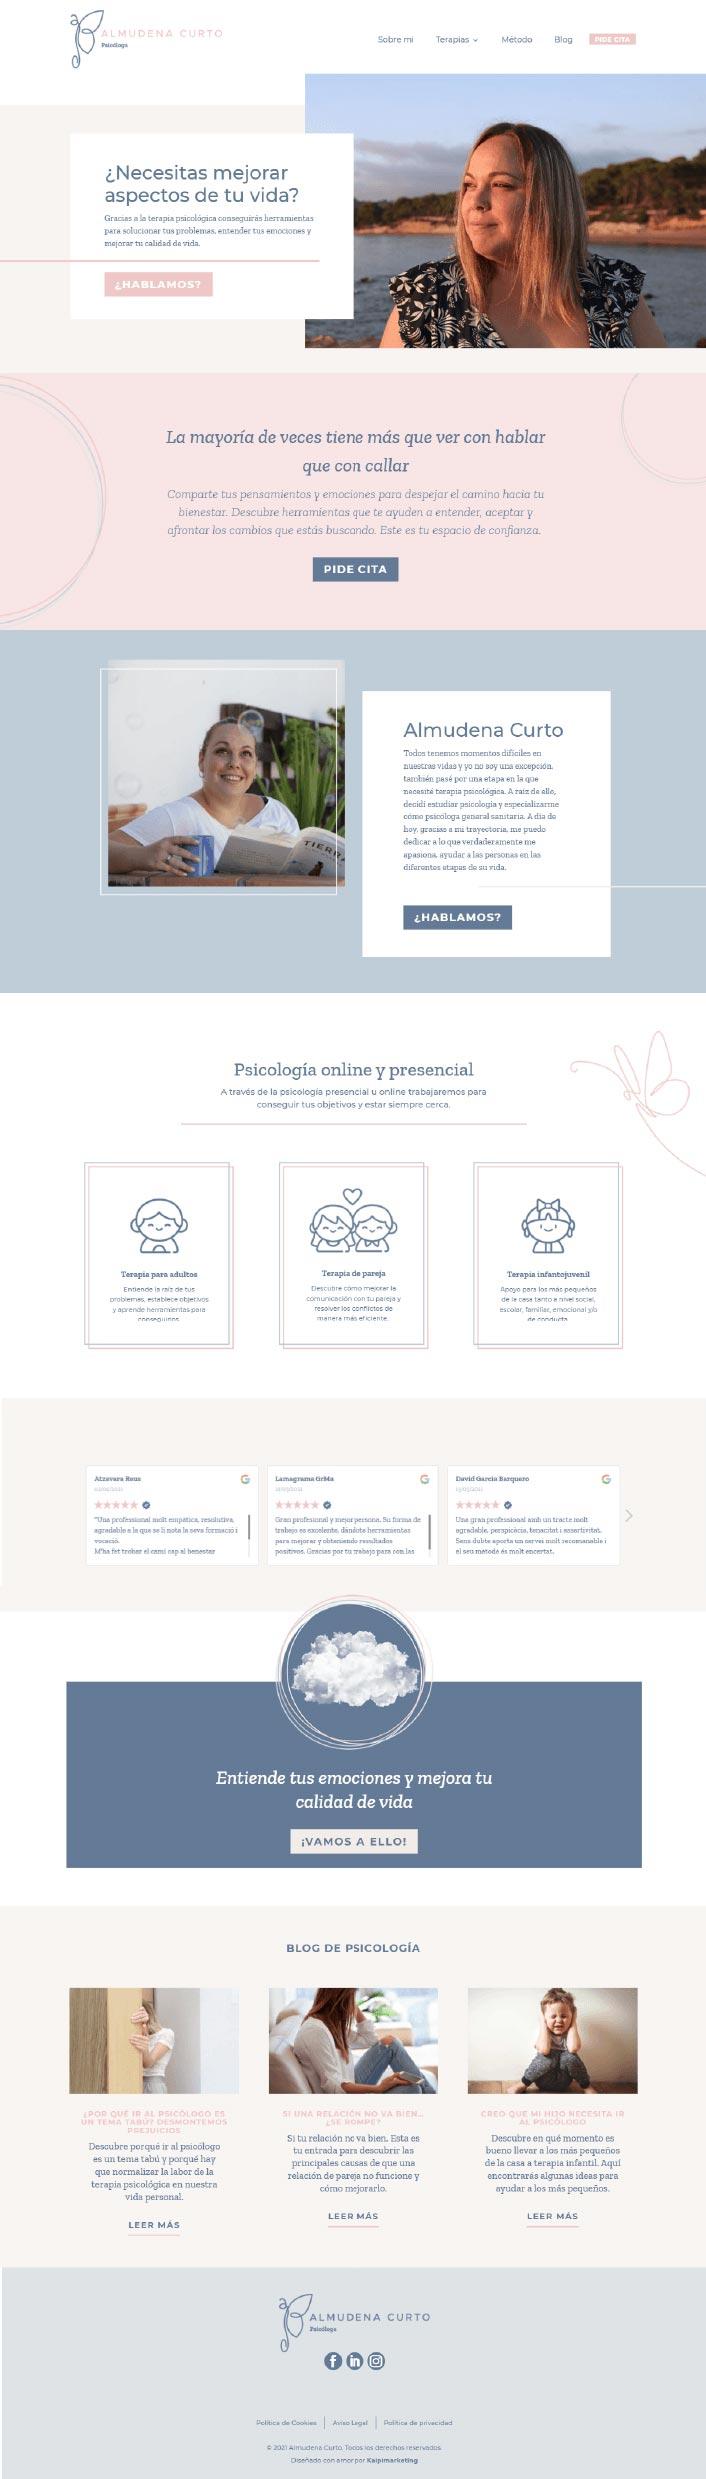 Kaipi Marketing Programacion web para Almudena Curto